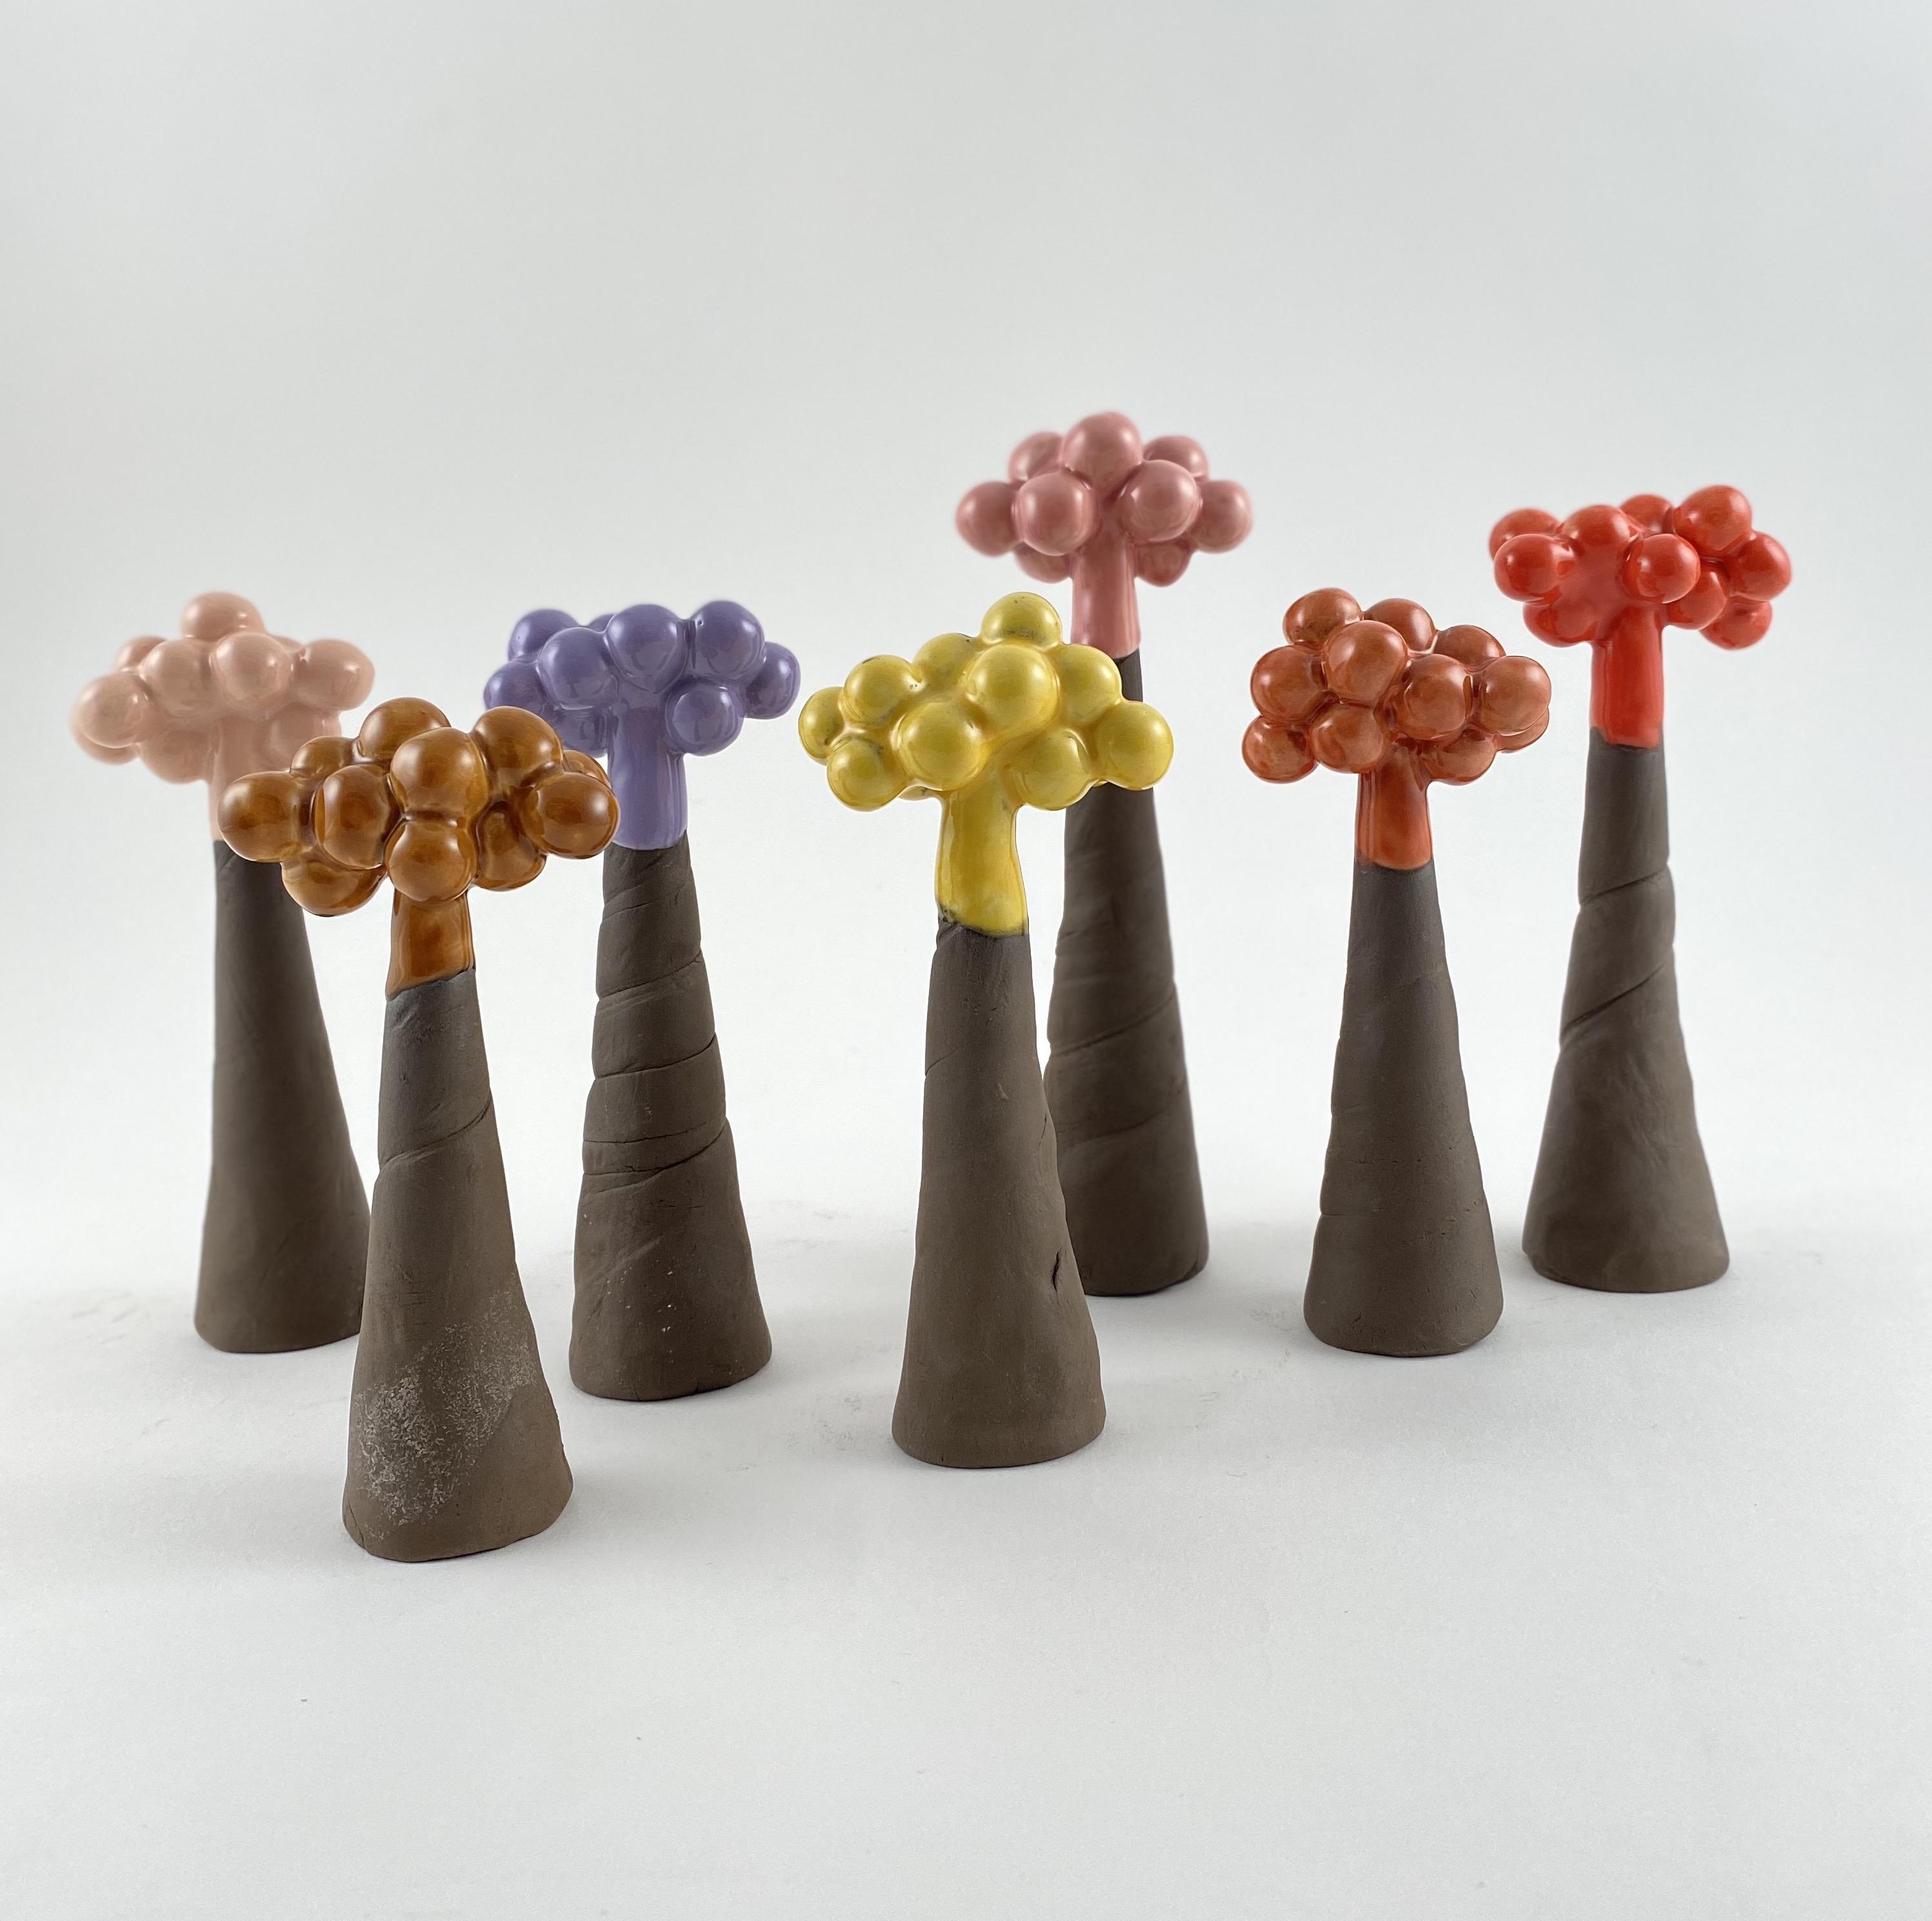 CARLAS CAOS -  Små træer flere nye farver